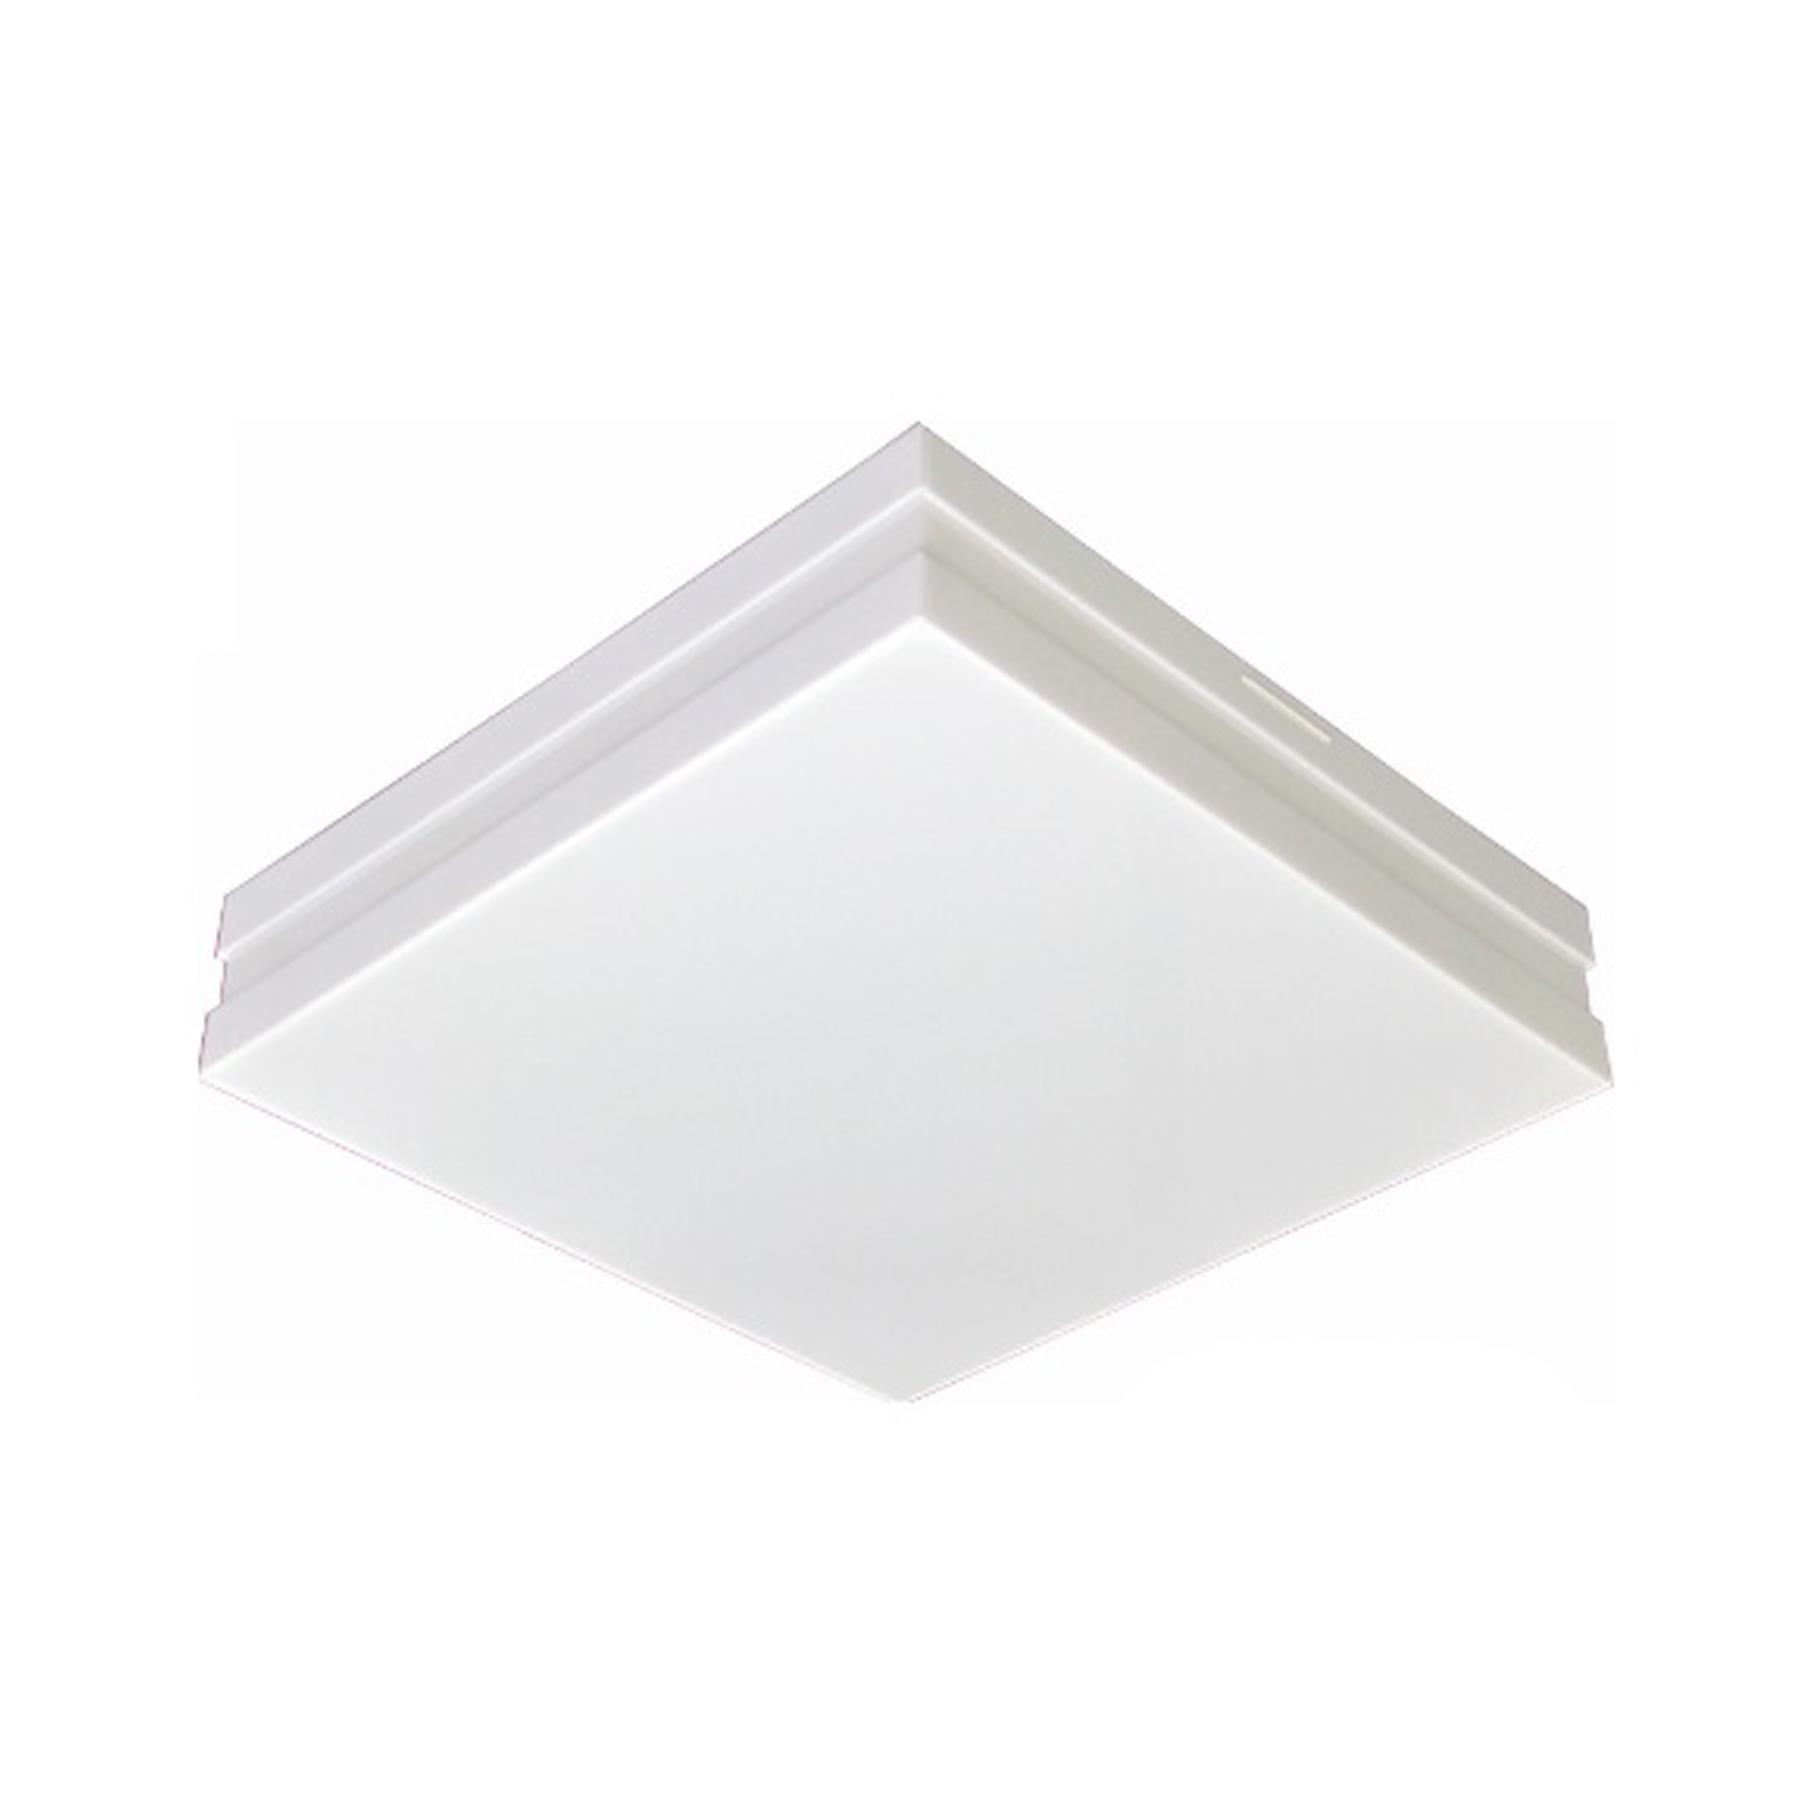 Luminária LED 25w Sobrepor Branco Bilbao 6500k Tualux